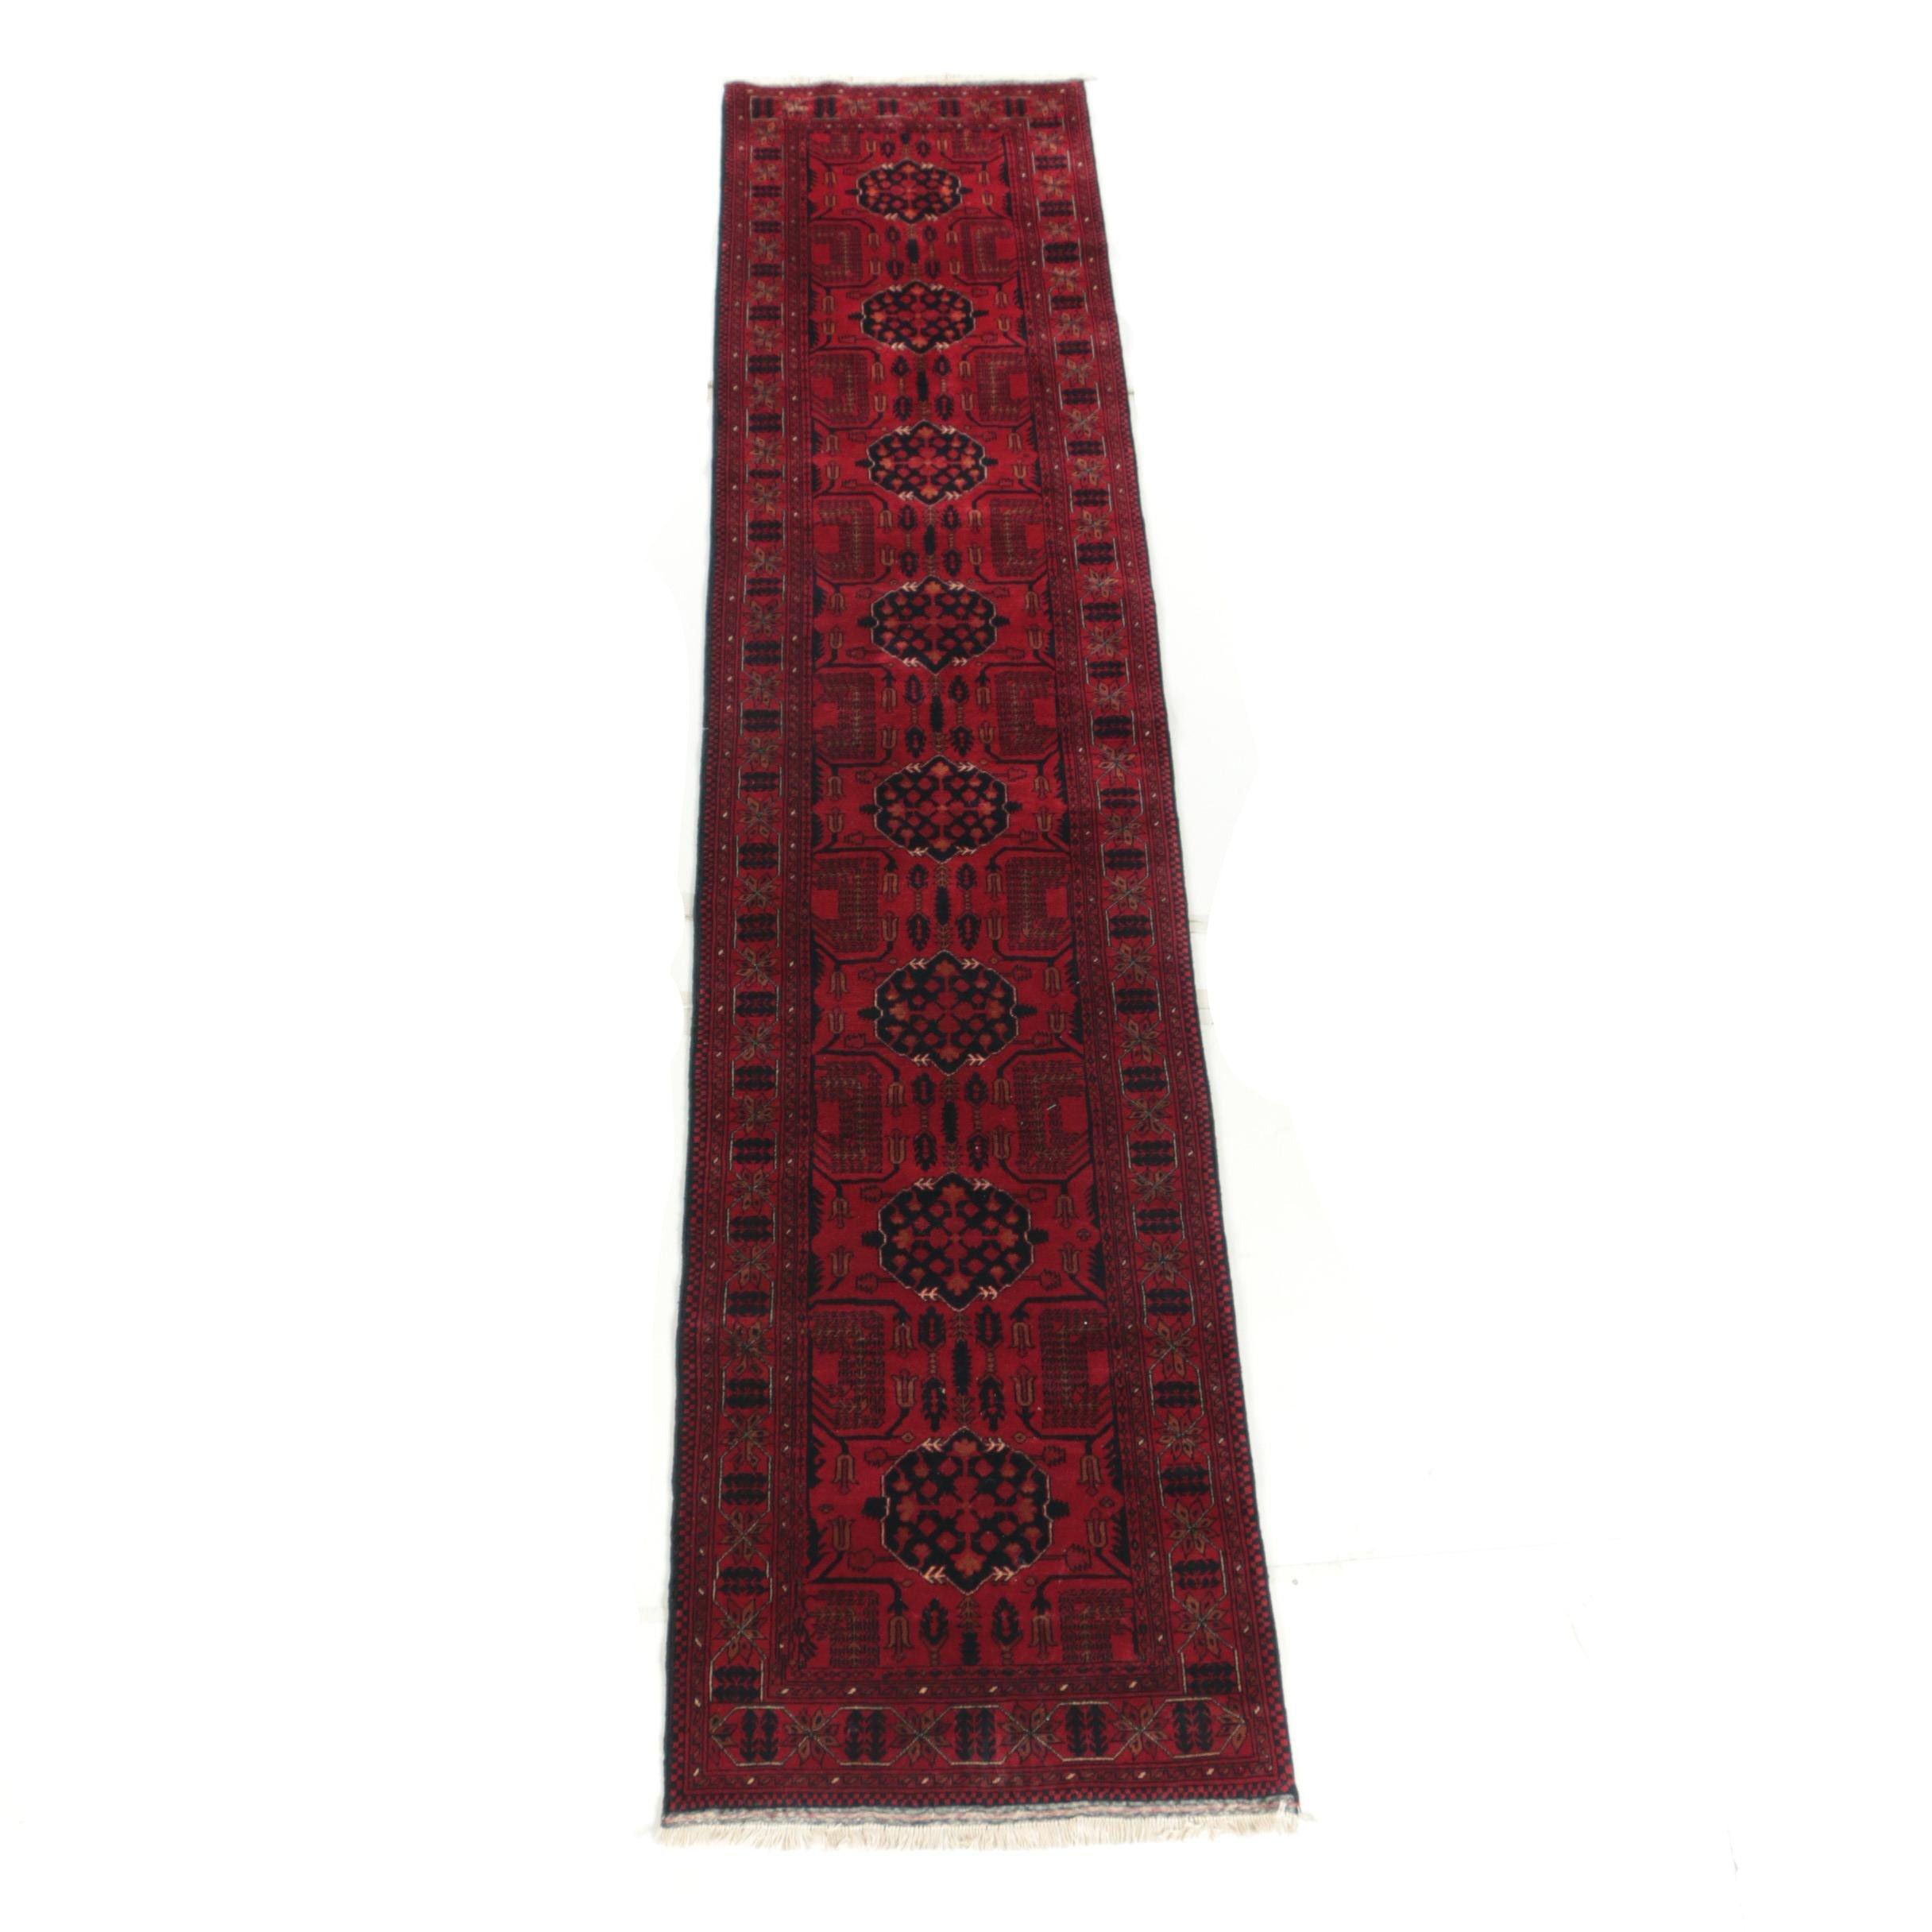 Power Loomed Turkish Birecik Wool Carpet Runner by Yüksel Hale